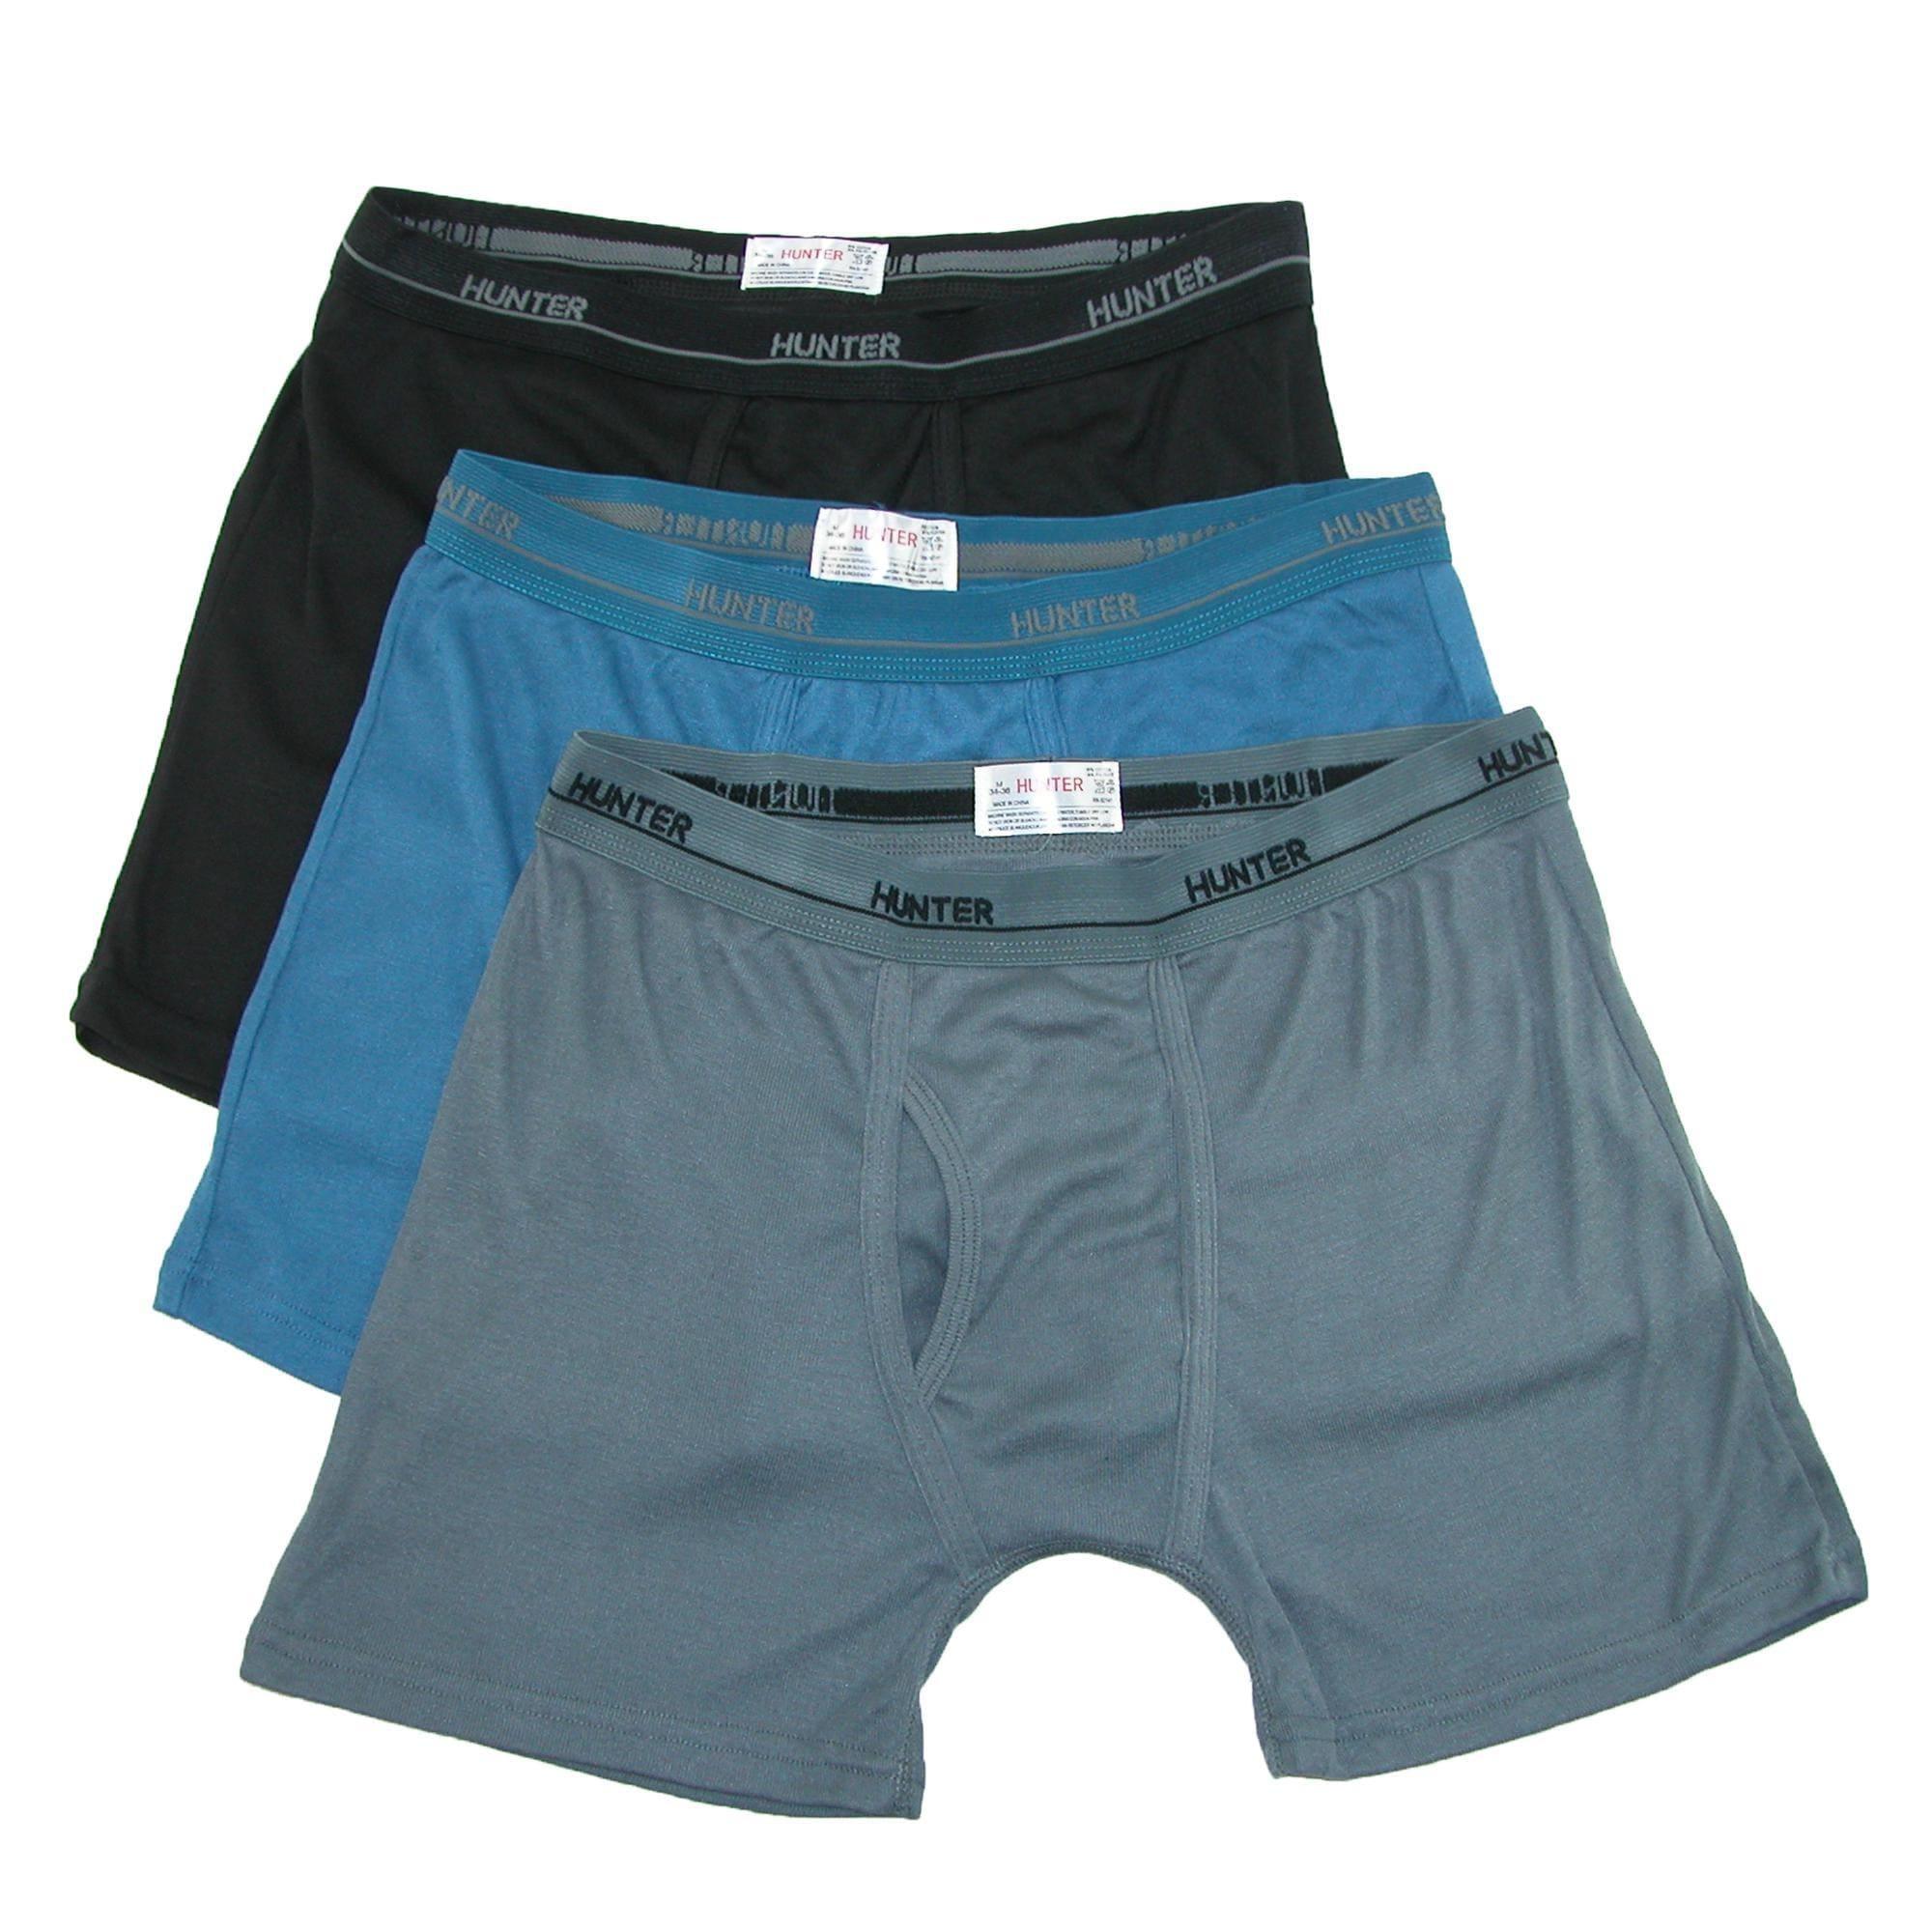 Hunter Men's Boxer Brief Underwear (3 Pair Pack) - Multi - Overstock -  14281958